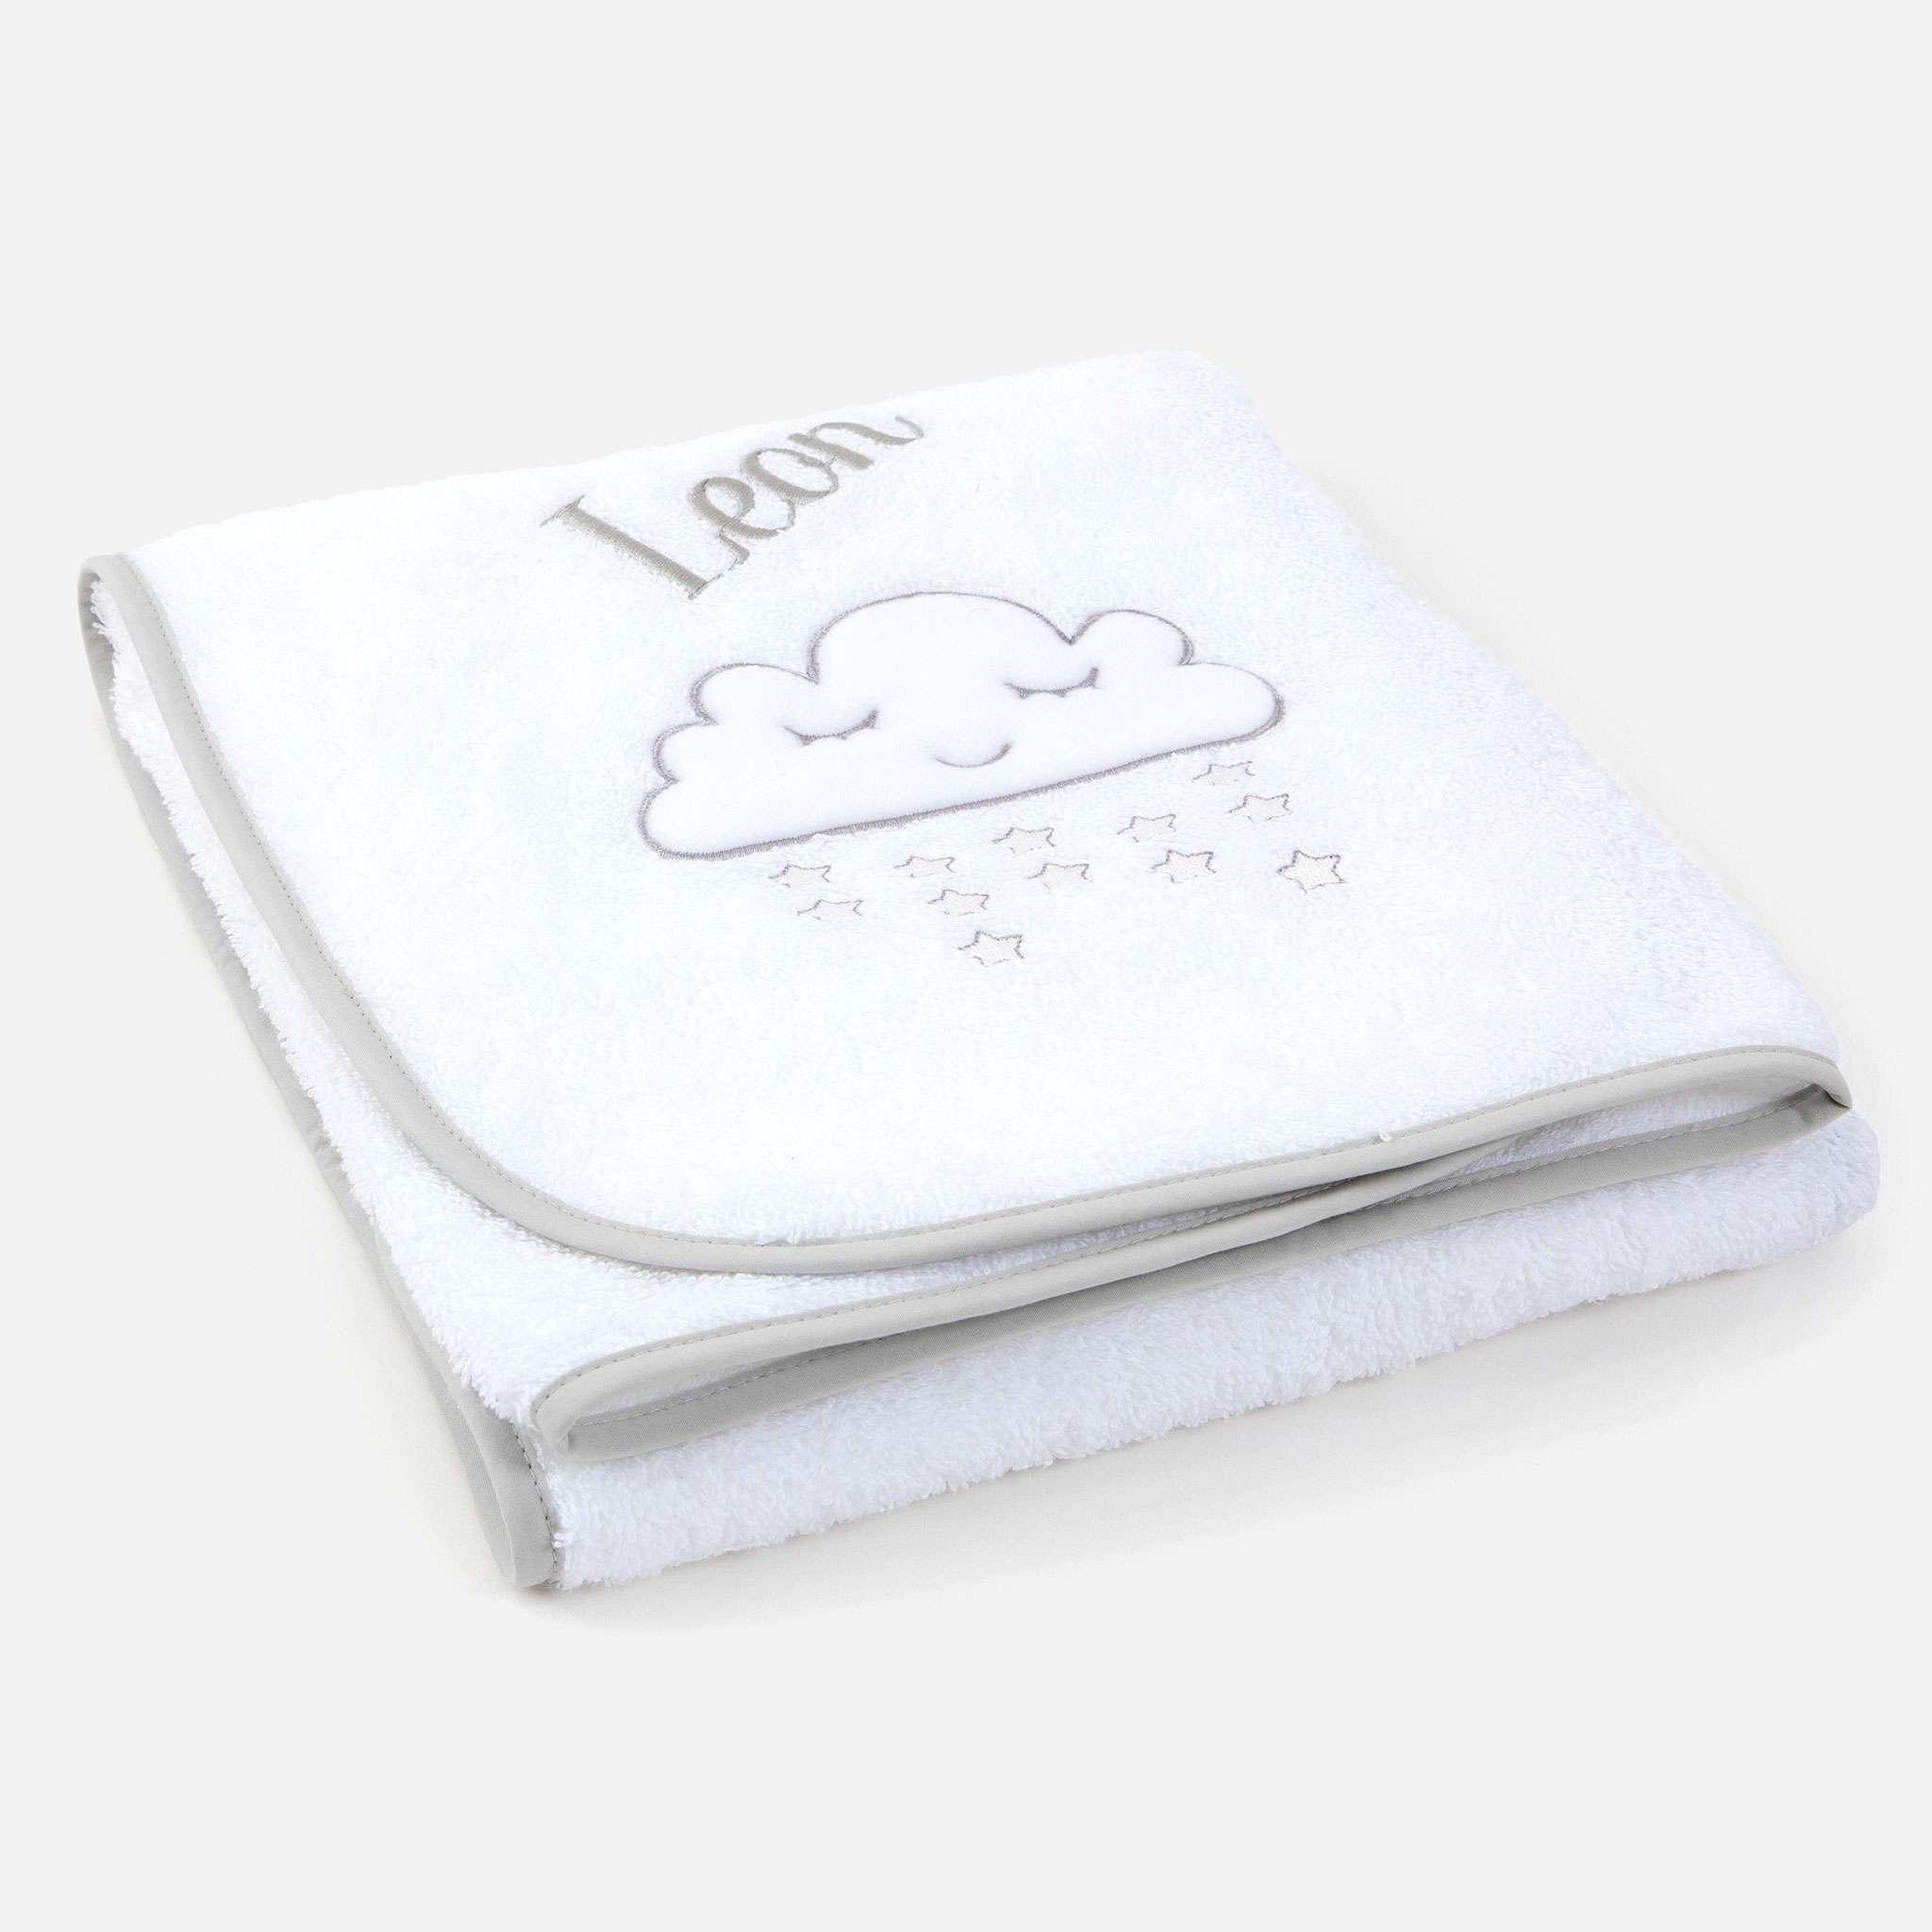 Clouds handduk 72x72 cm